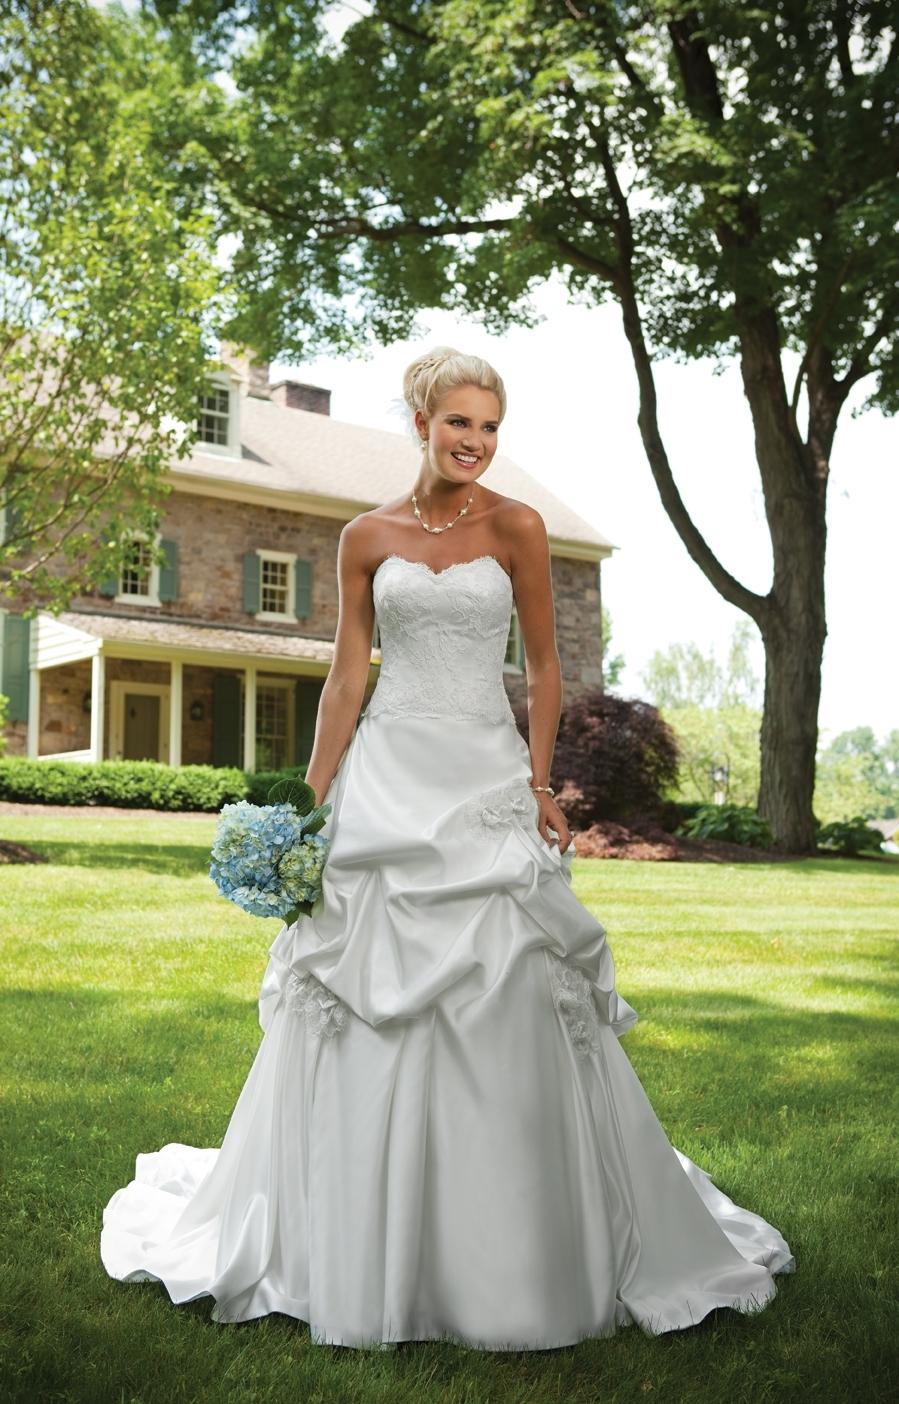 E231127-spring-2011-wedding-dress-kathy-ireland-2bebride-front.full